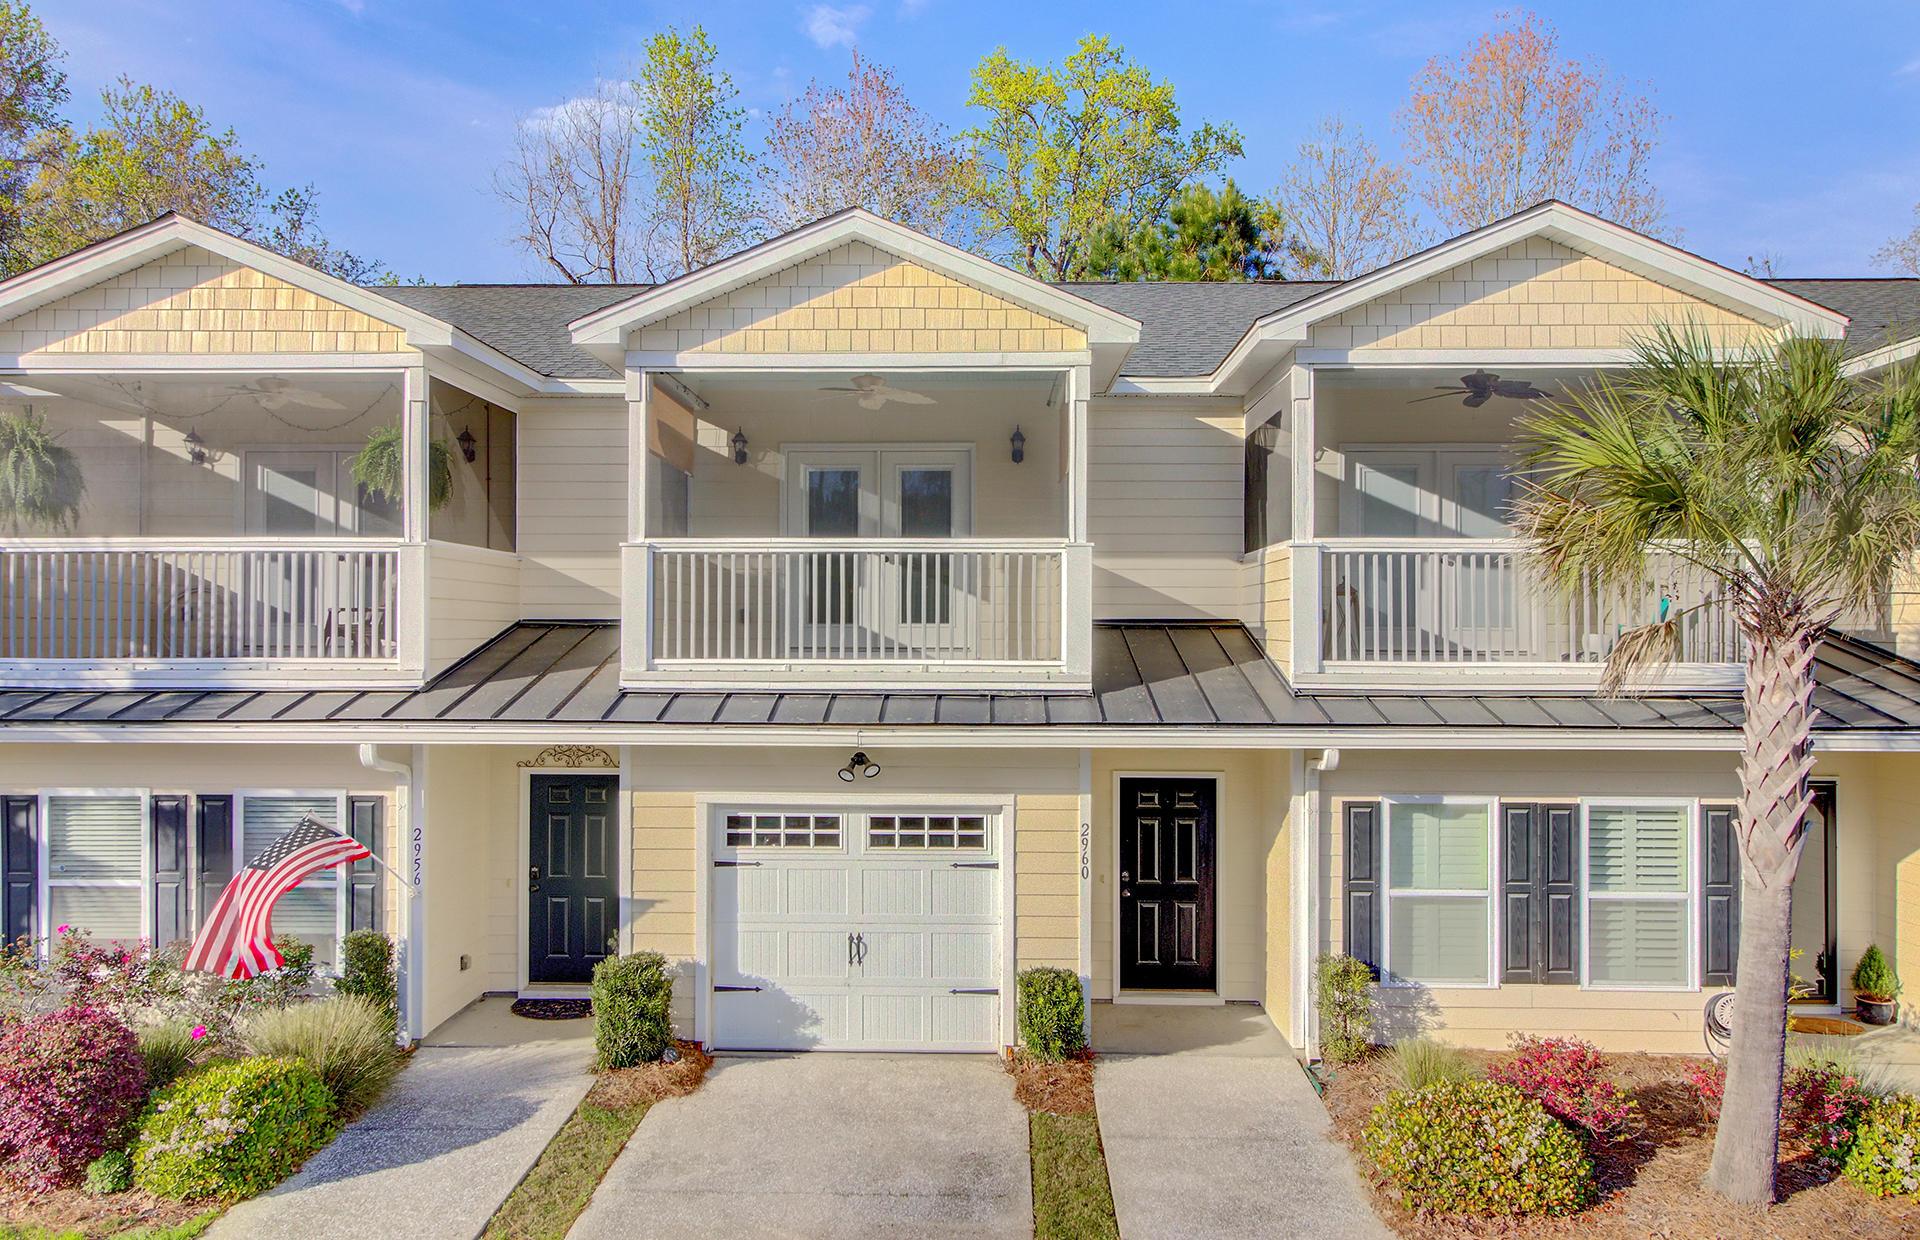 Carol Oaks Town Homes Homes For Sale - 2960 Emma, Mount Pleasant, SC - 0